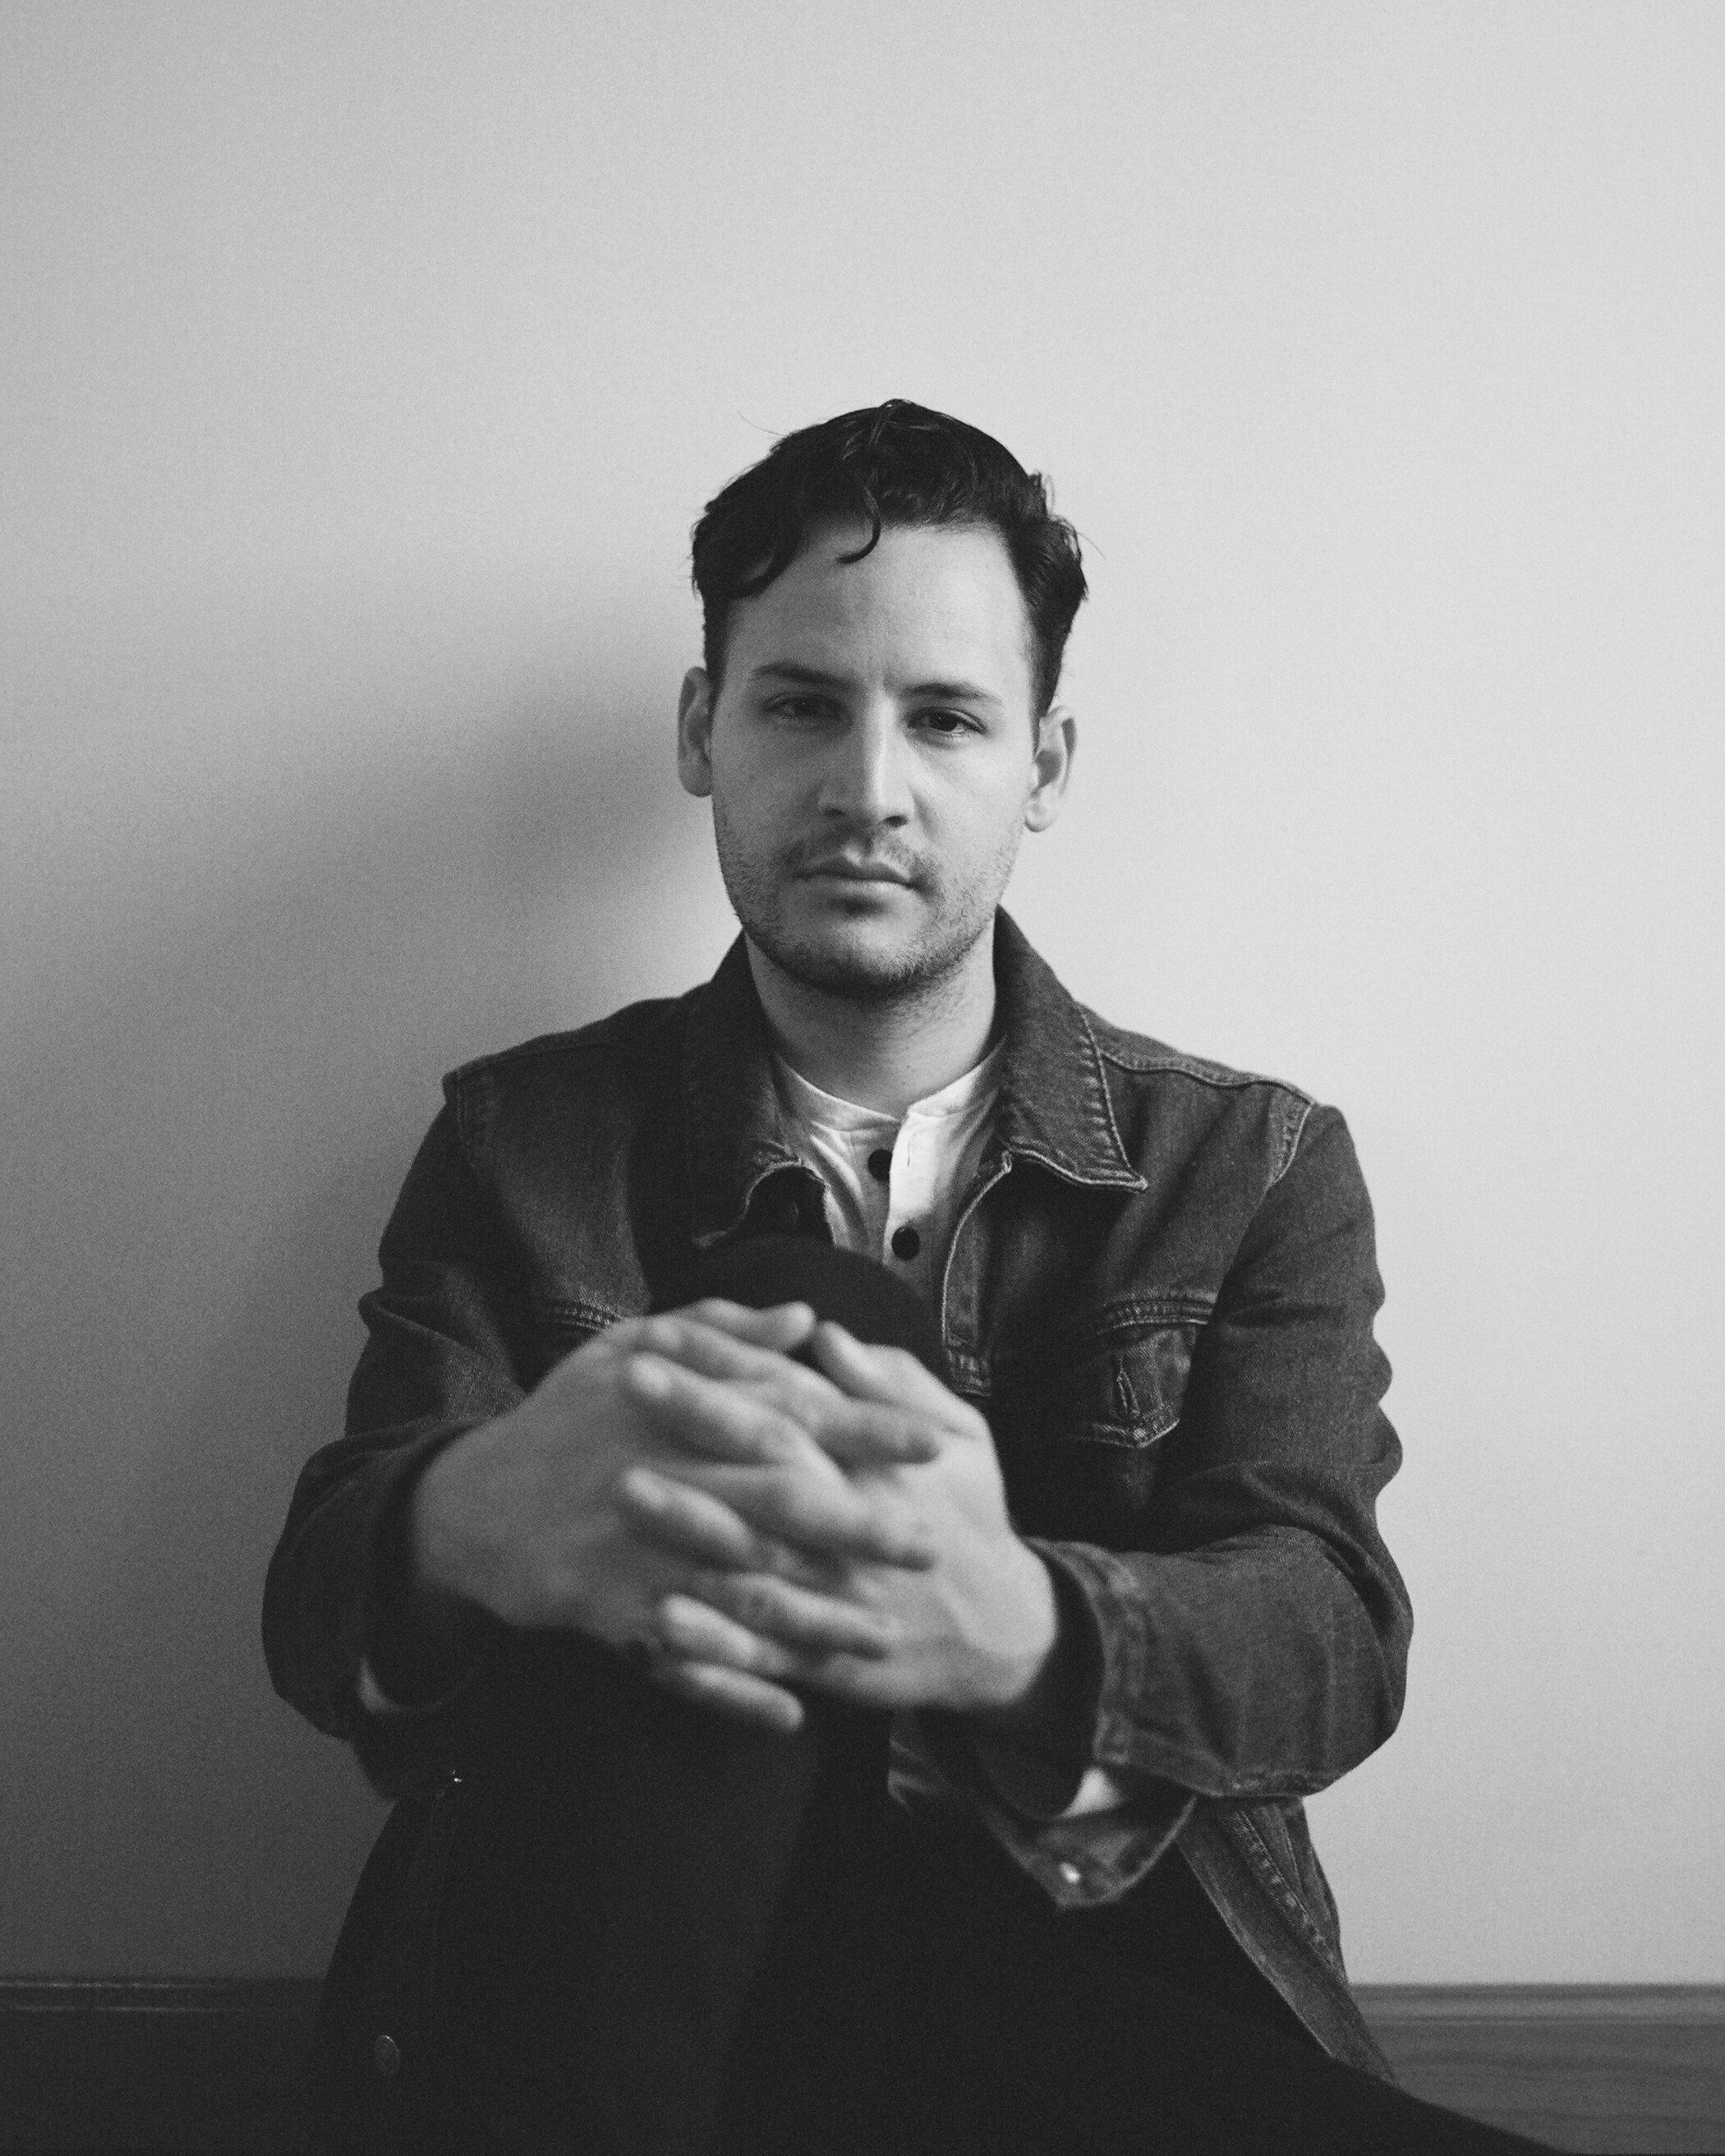 259-aaron-durall-nyc-editorial-portrait-photographer.jpg